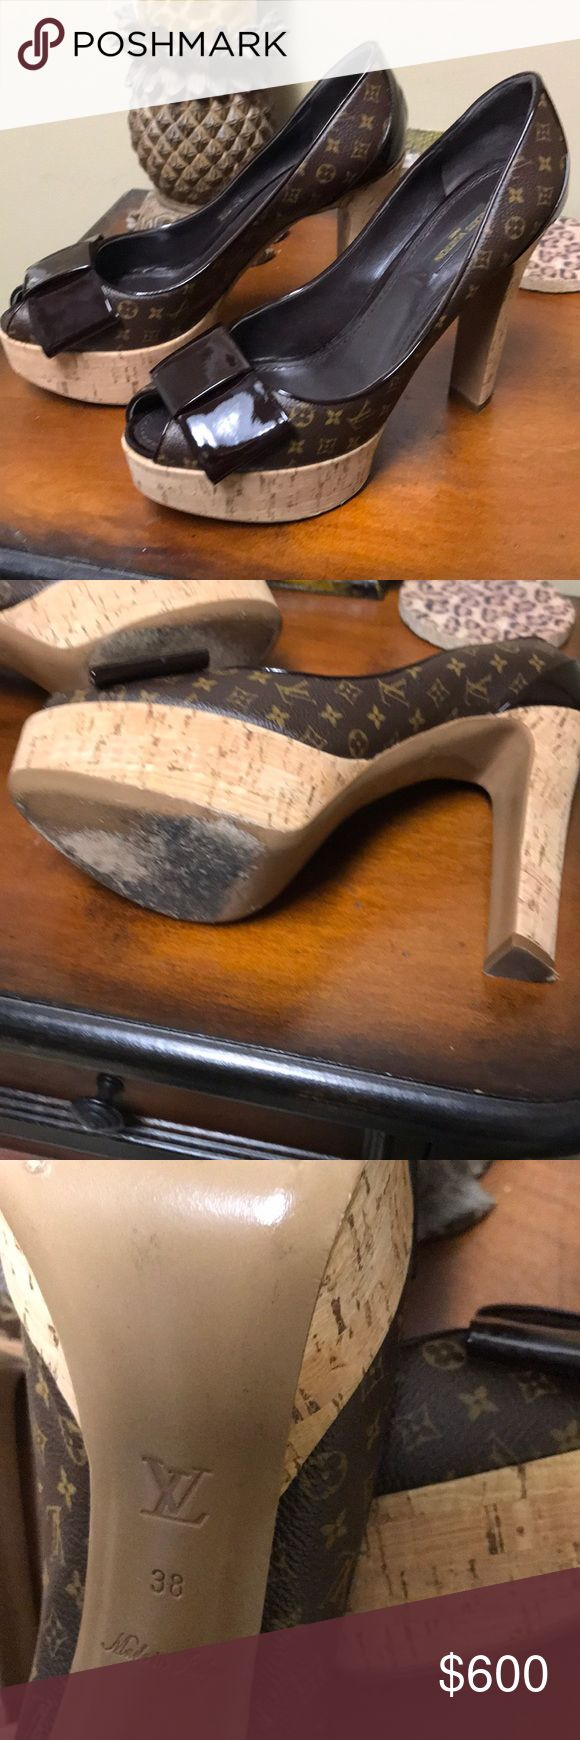 Authentic Louis Vuitton Monogram Cork Heels Excellent condition. Authentic Louis Vuitton Heels. Size 38 or 8 in US. Louis Vuitton Shoes Heels